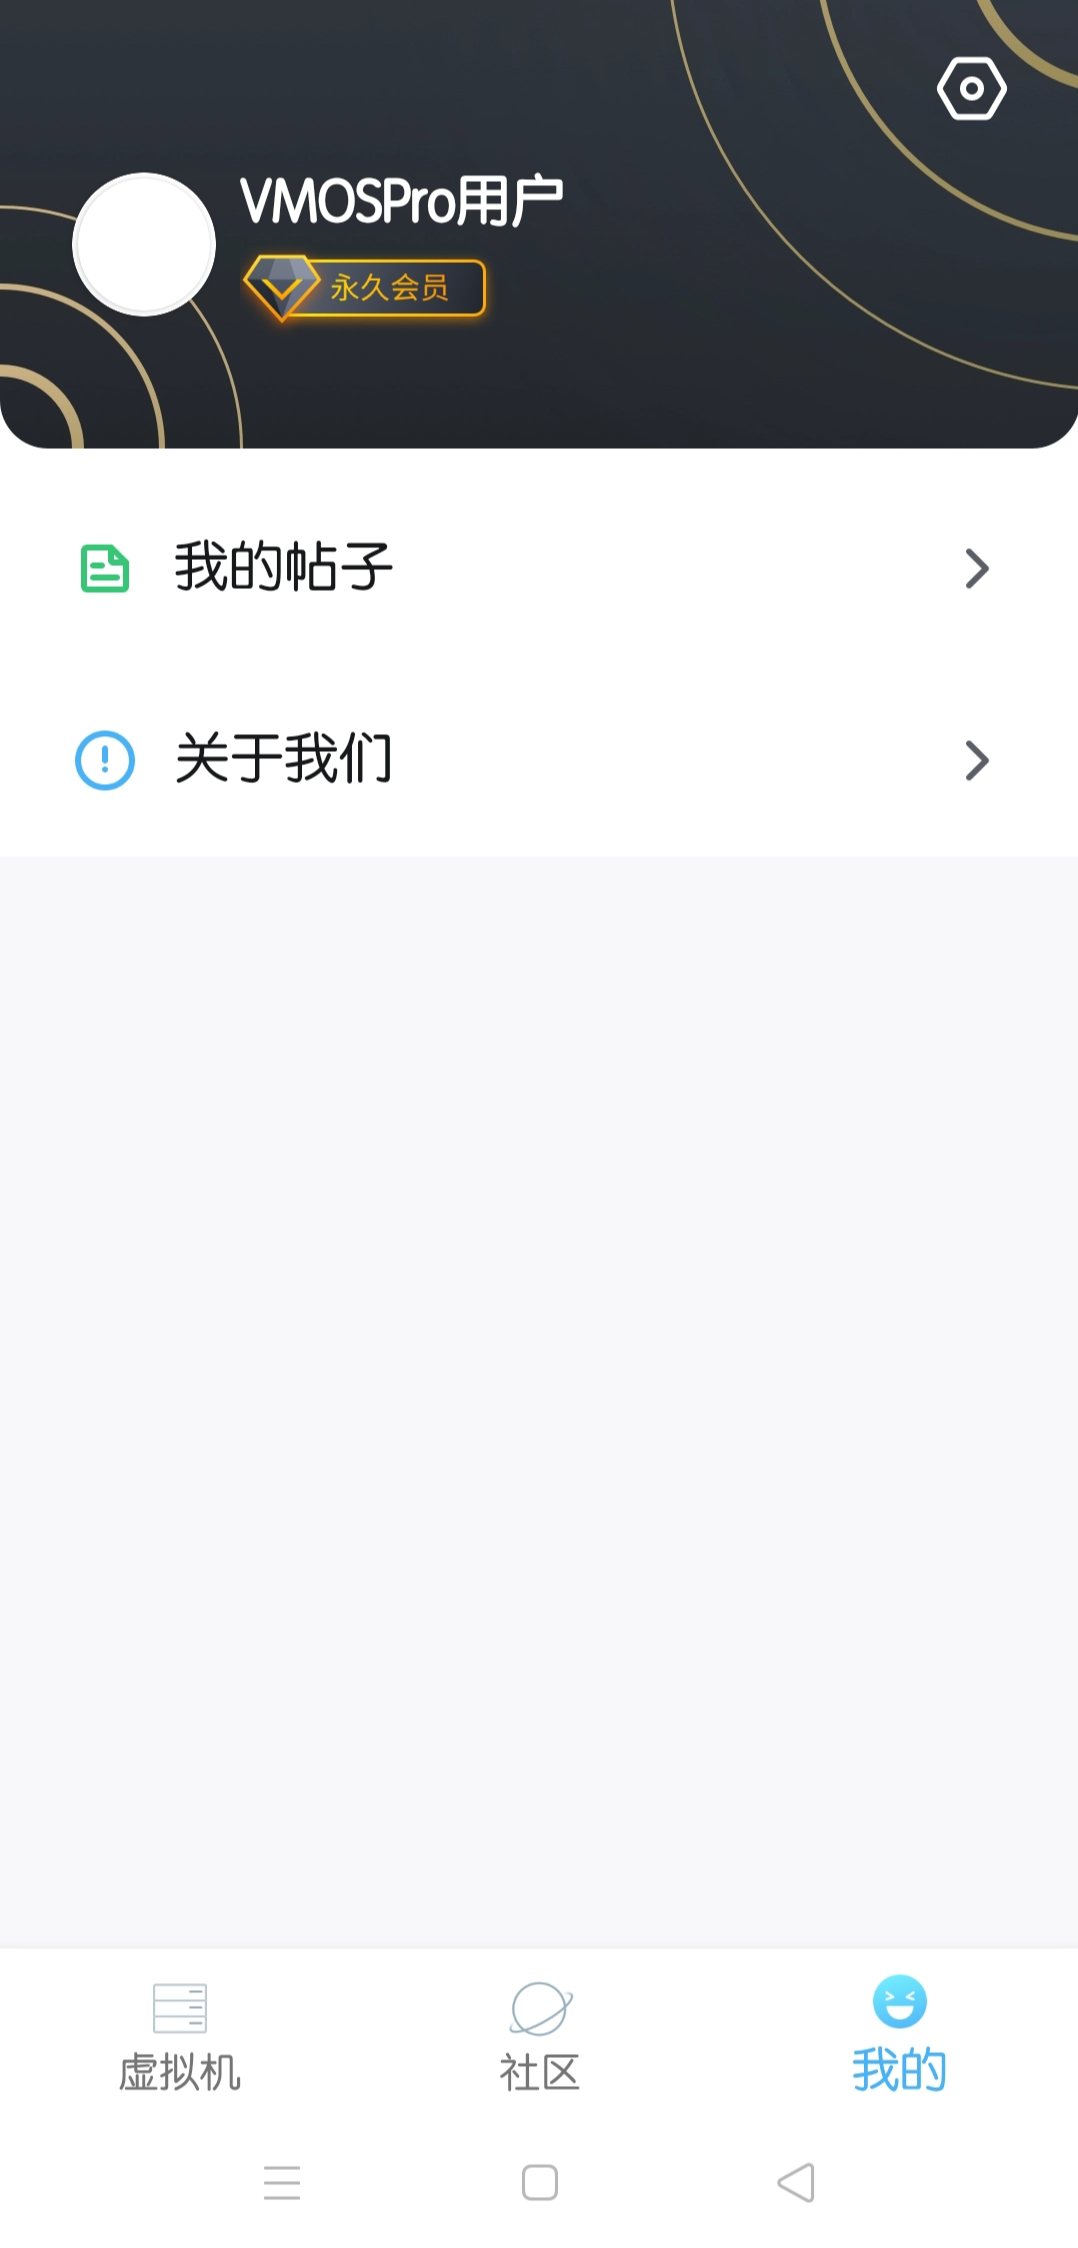 Vmos Pro 1.2.1 免登陆+永久会员版